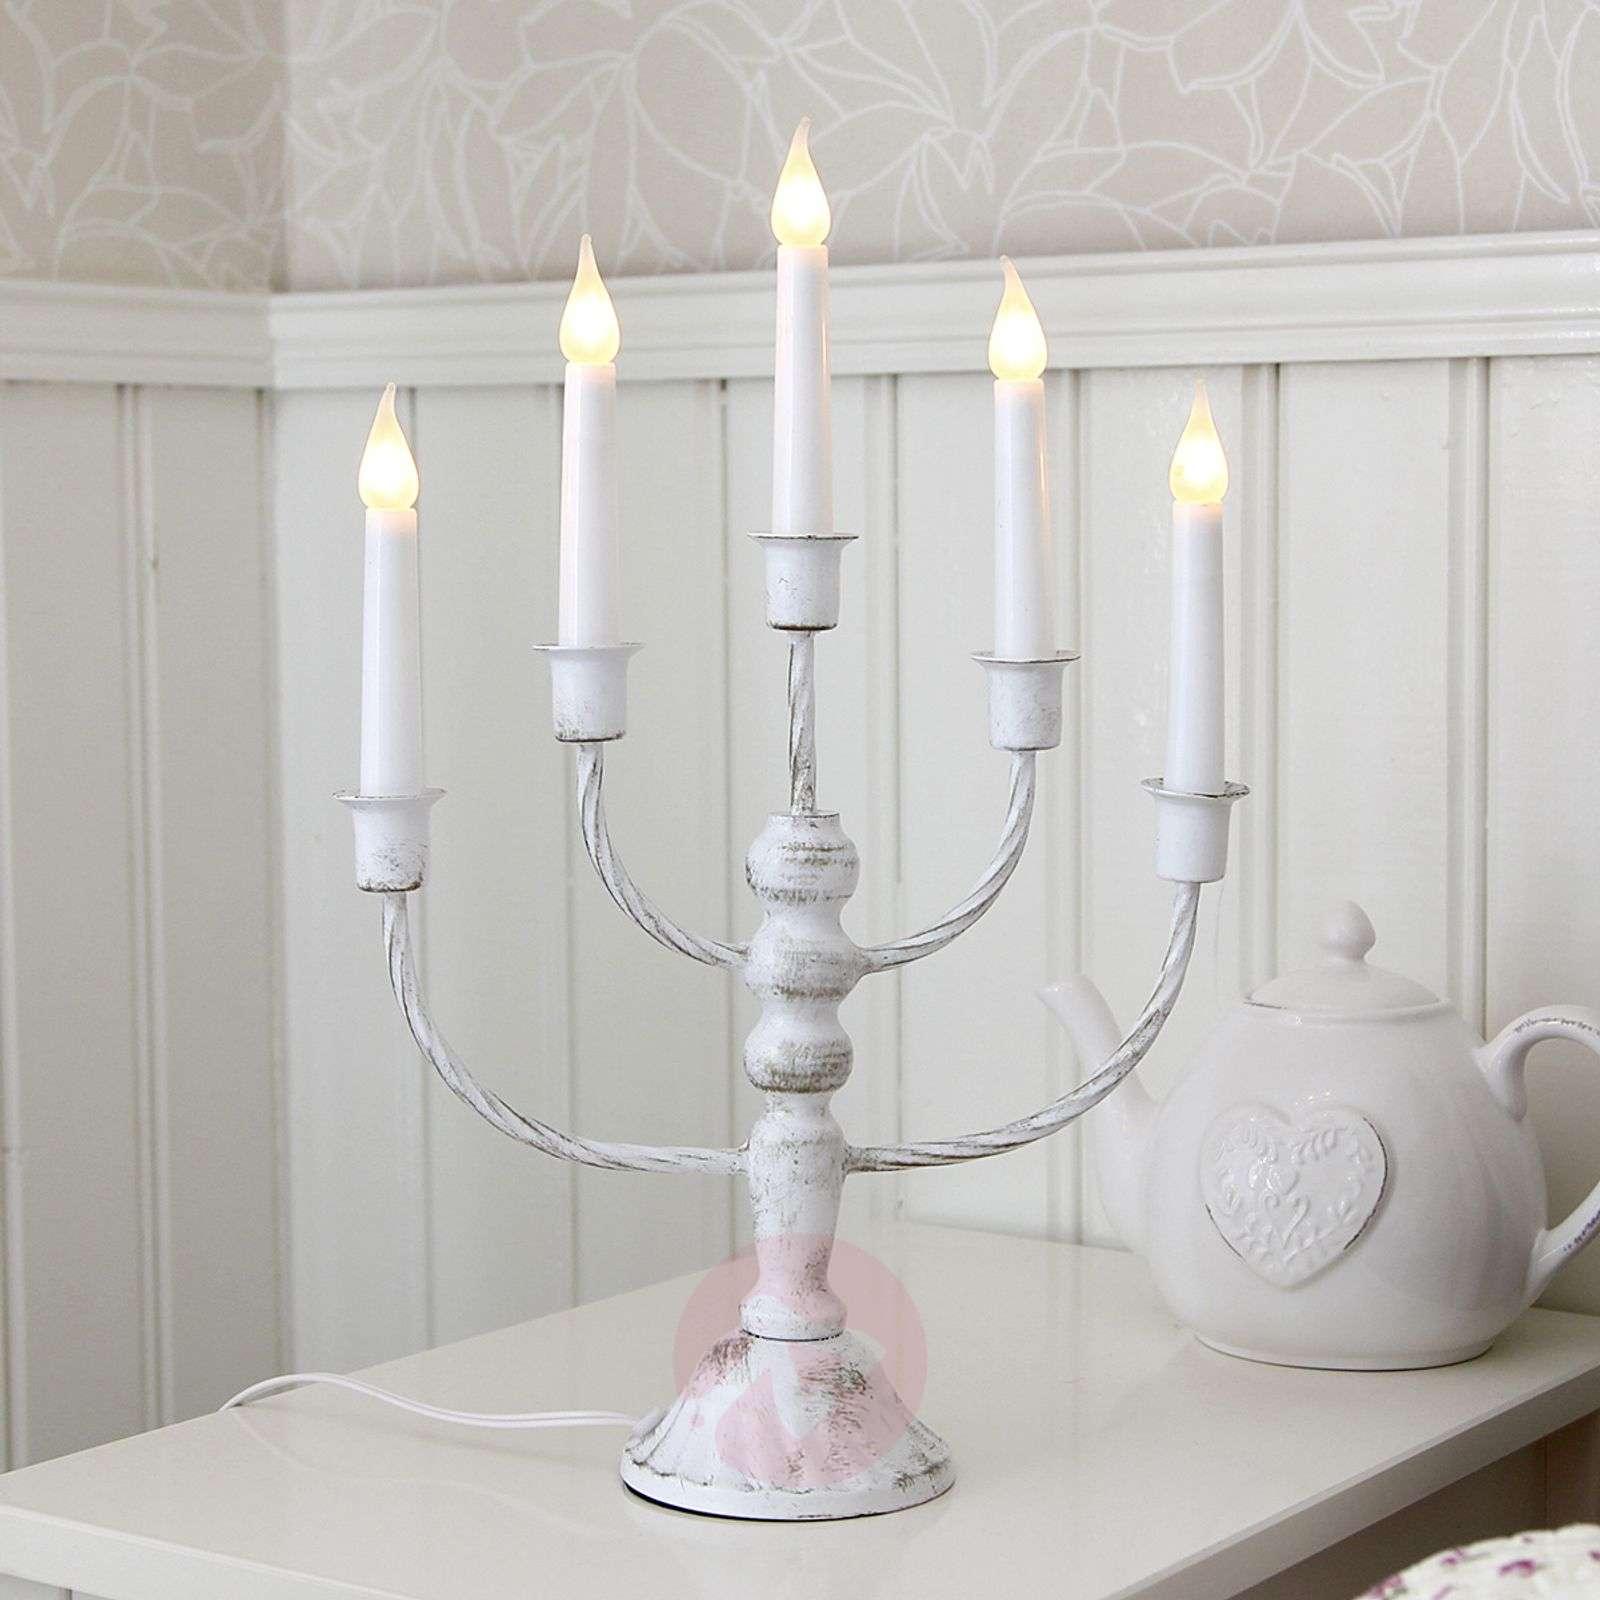 Antique white candleholder Romana, 5 lights-1522751-01